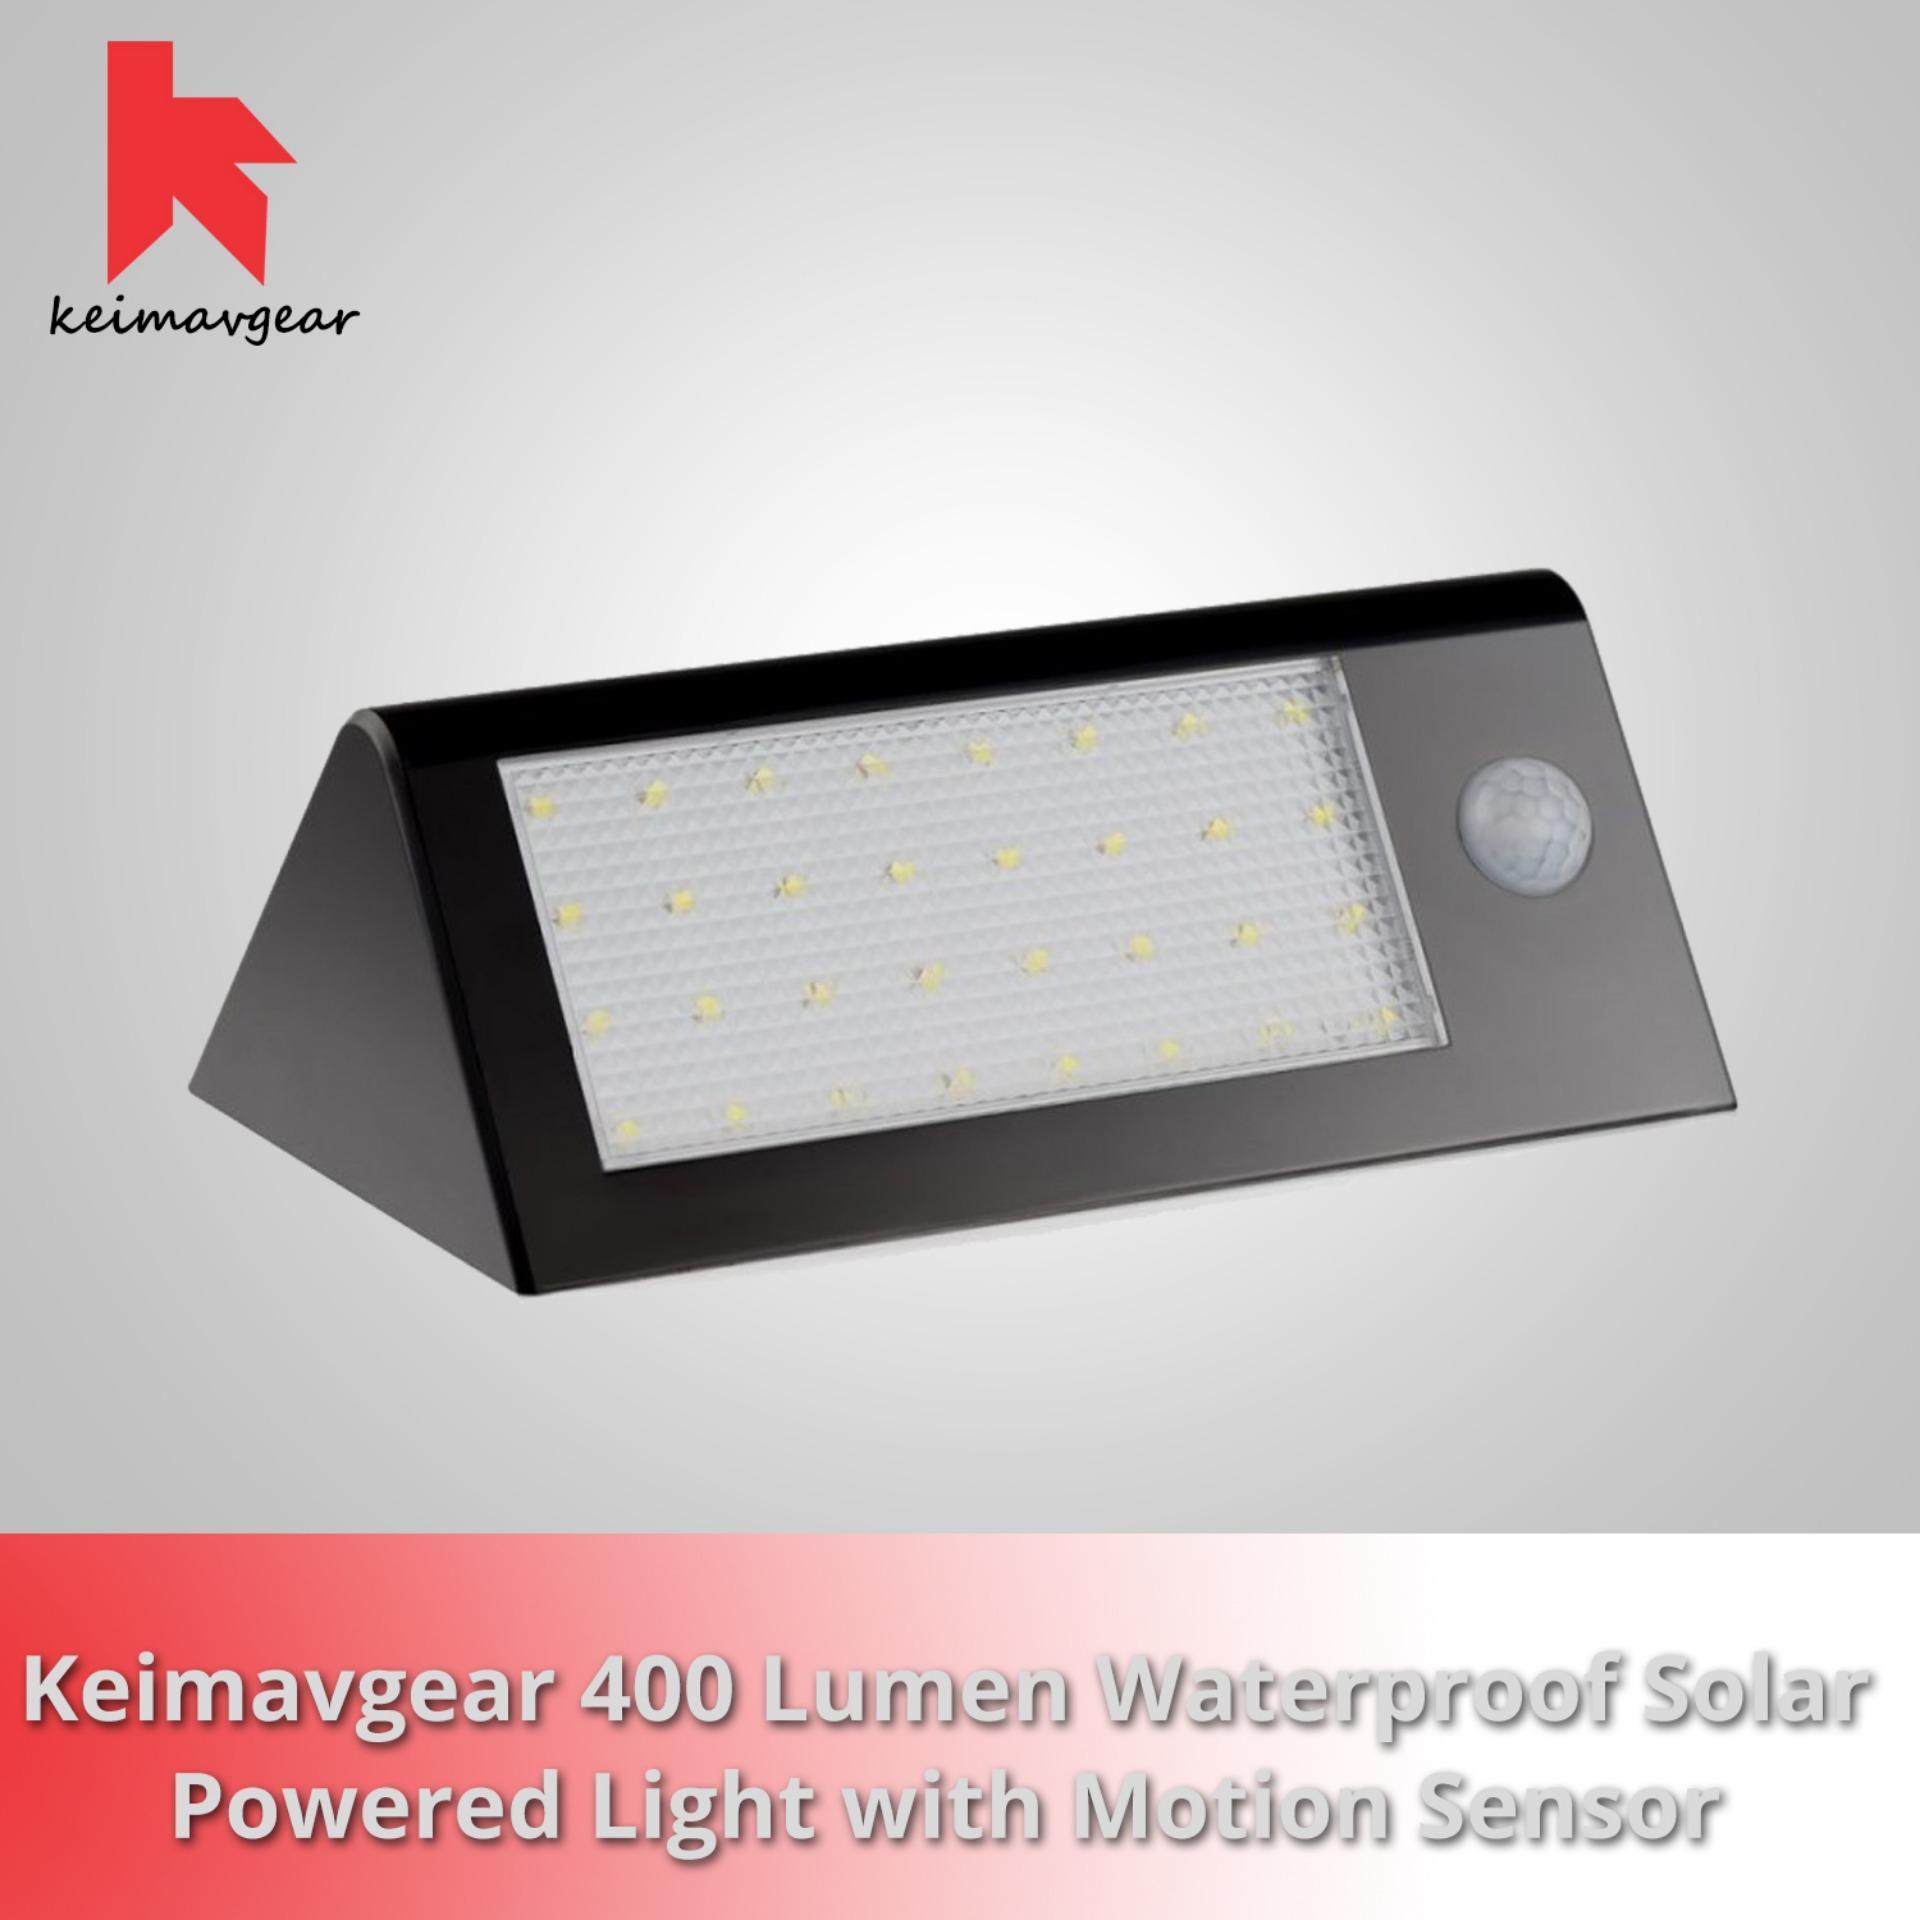 Complete Keimavgear 400 Lumen Waterproof Solar Powered Outdoor Motion Sensor Detector Wall Light Product Preview